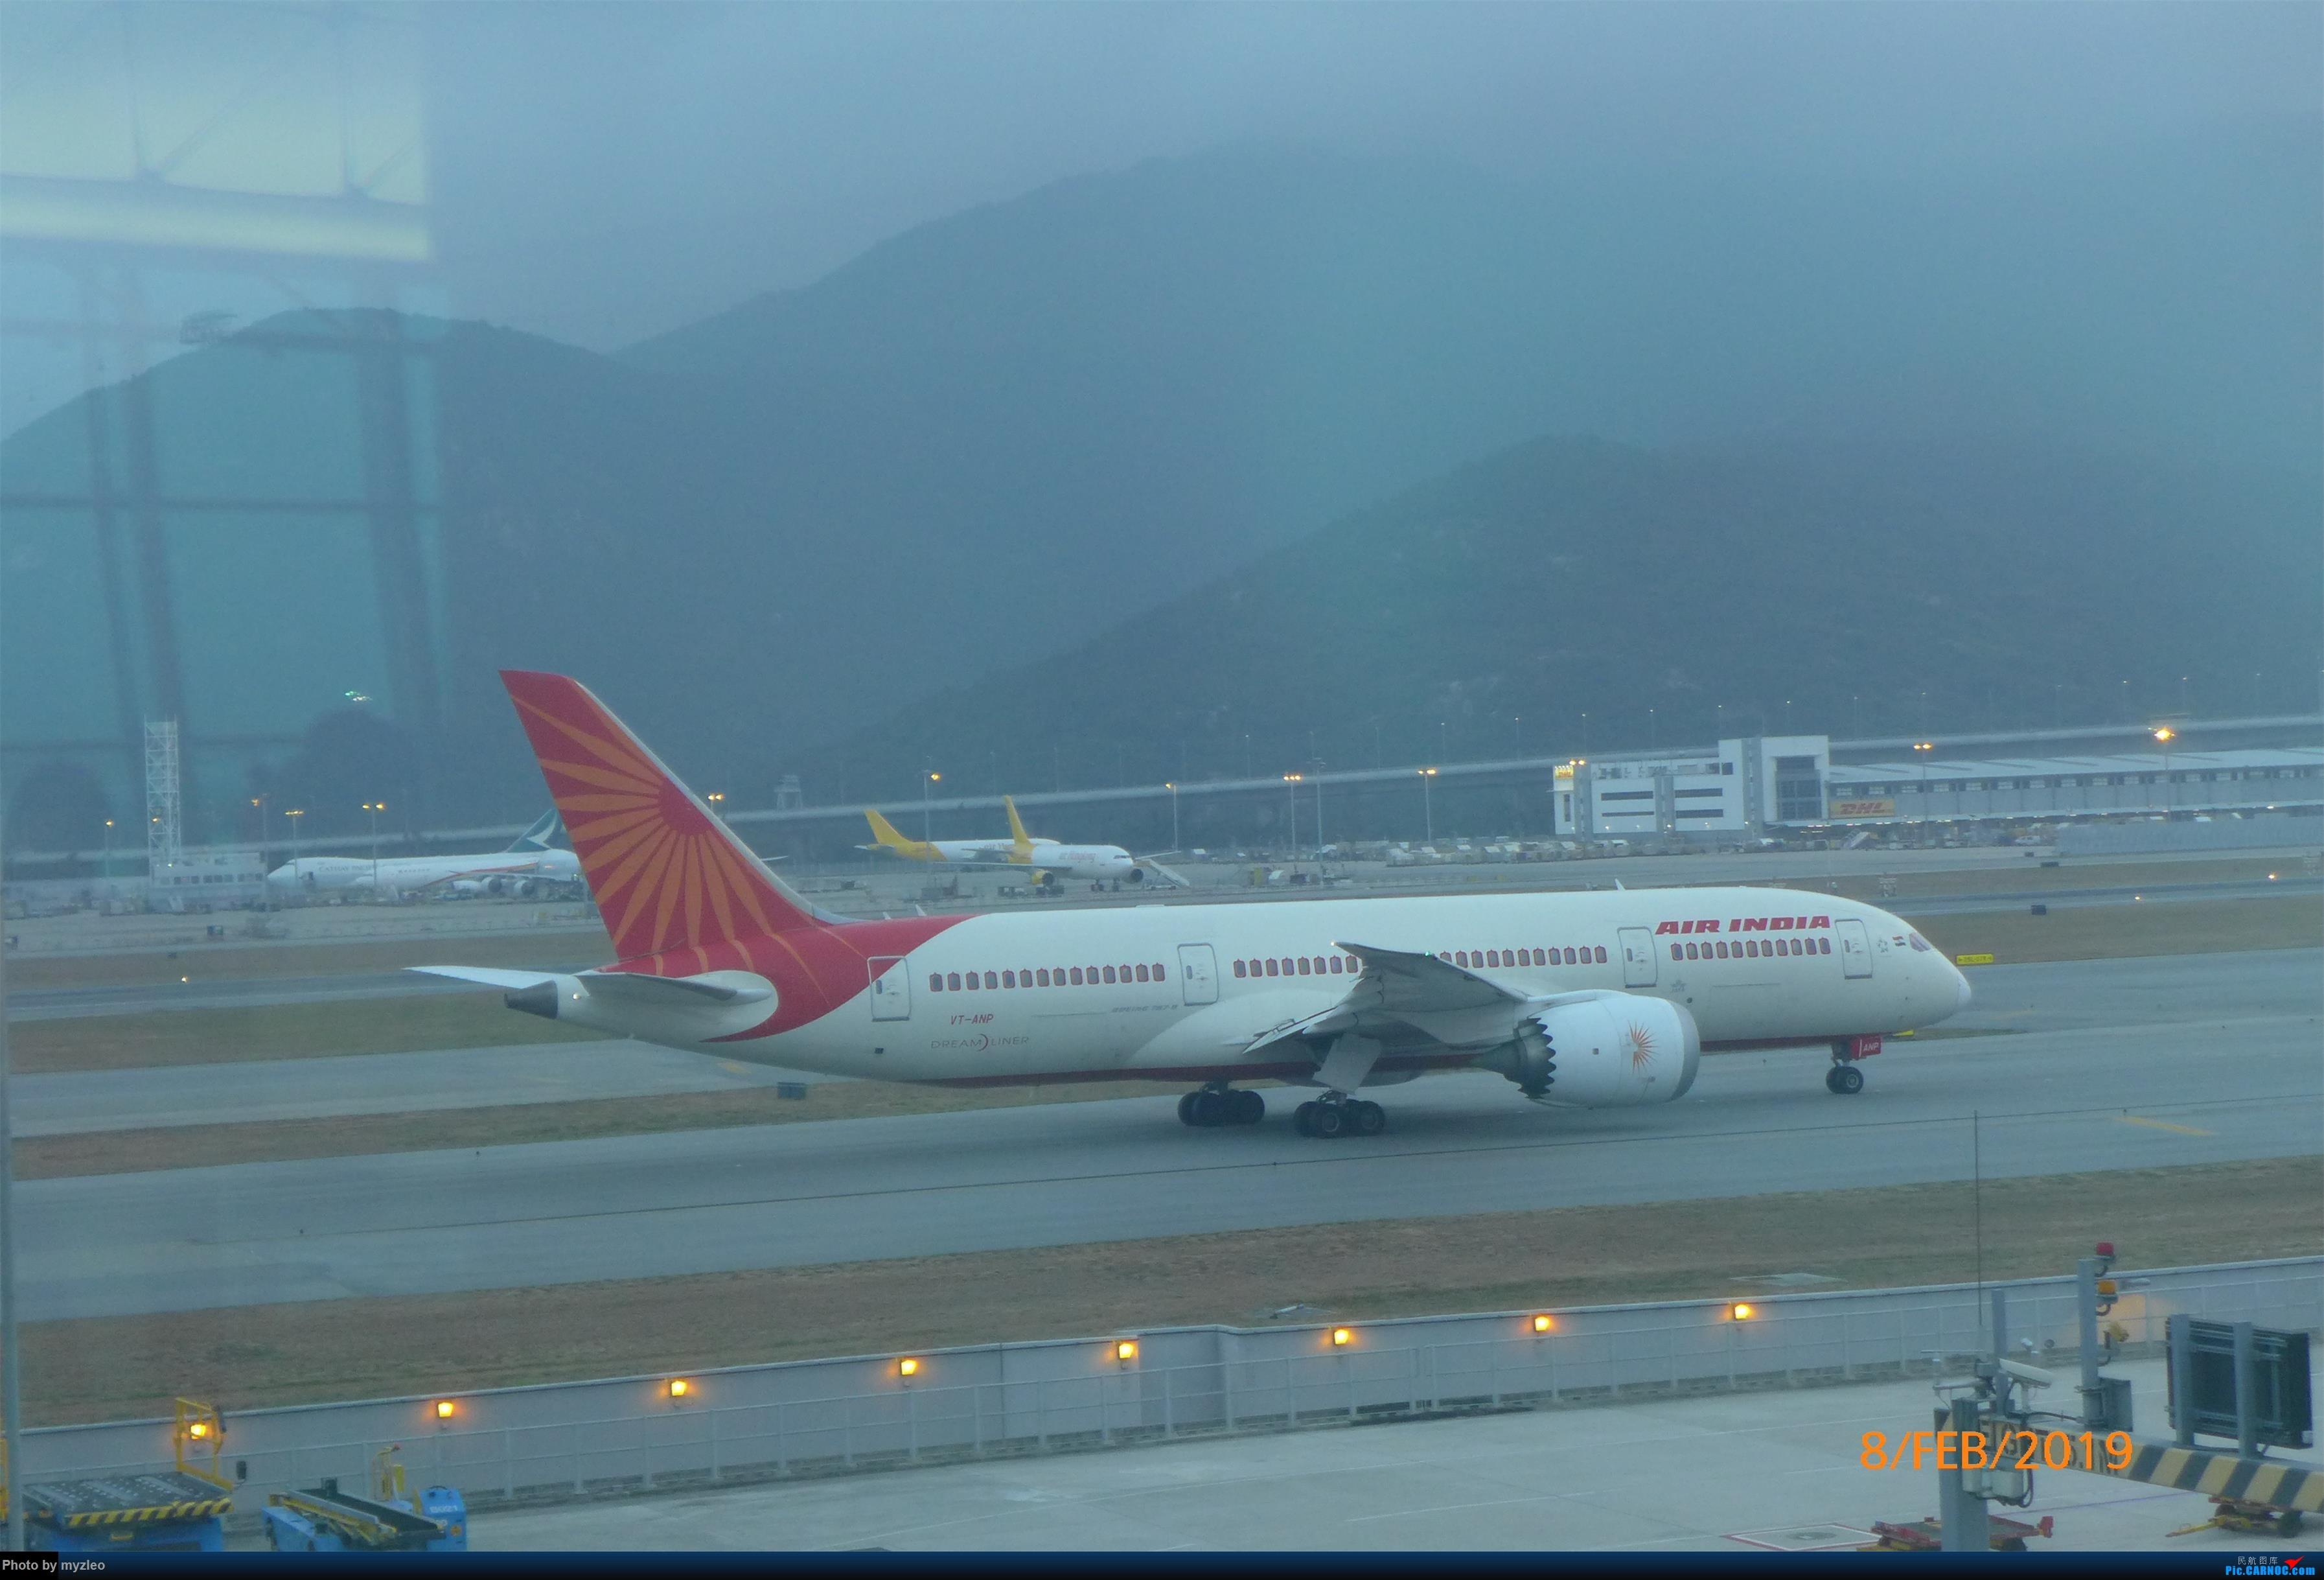 Re:[原创]【myzleo的游记4.5】十年之约(5)在香港的最后一天,搭乘港航333回沪 BOEING 787-8 VT-ANP 中国香港国际机场